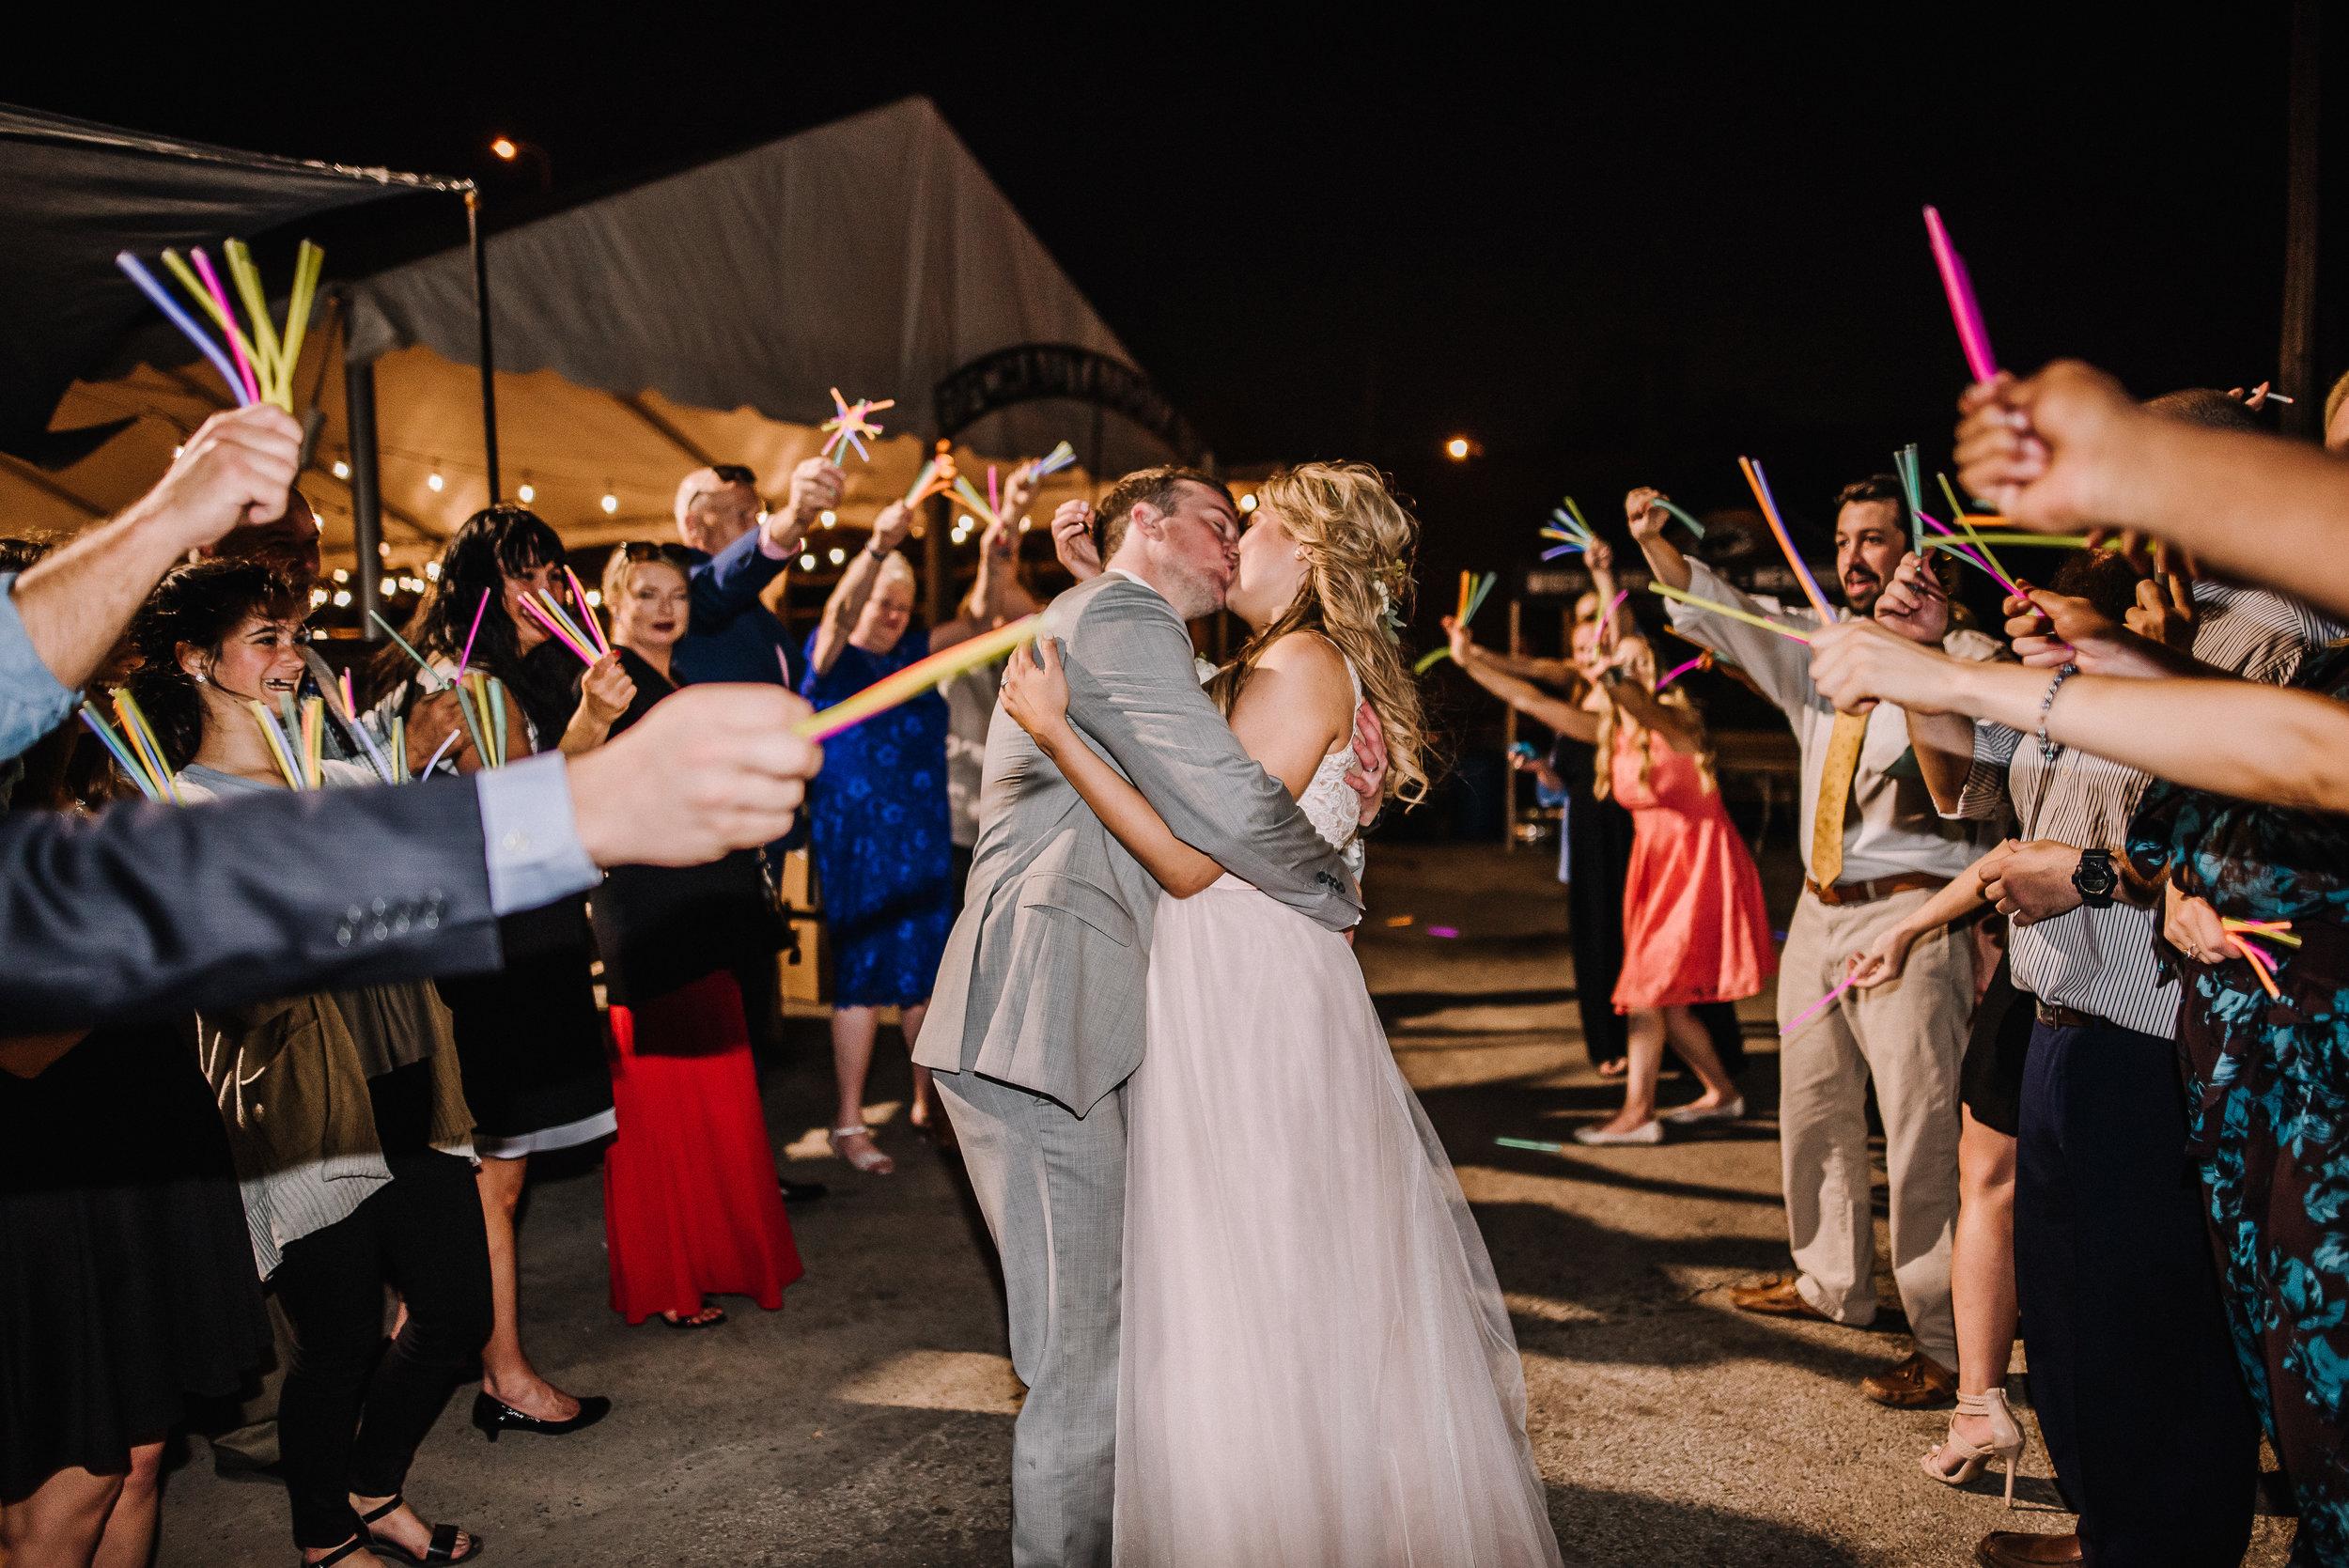 Pearson-Wiseacre-Wedding_Ashley-Benham-Photography (631 of 633).jpg